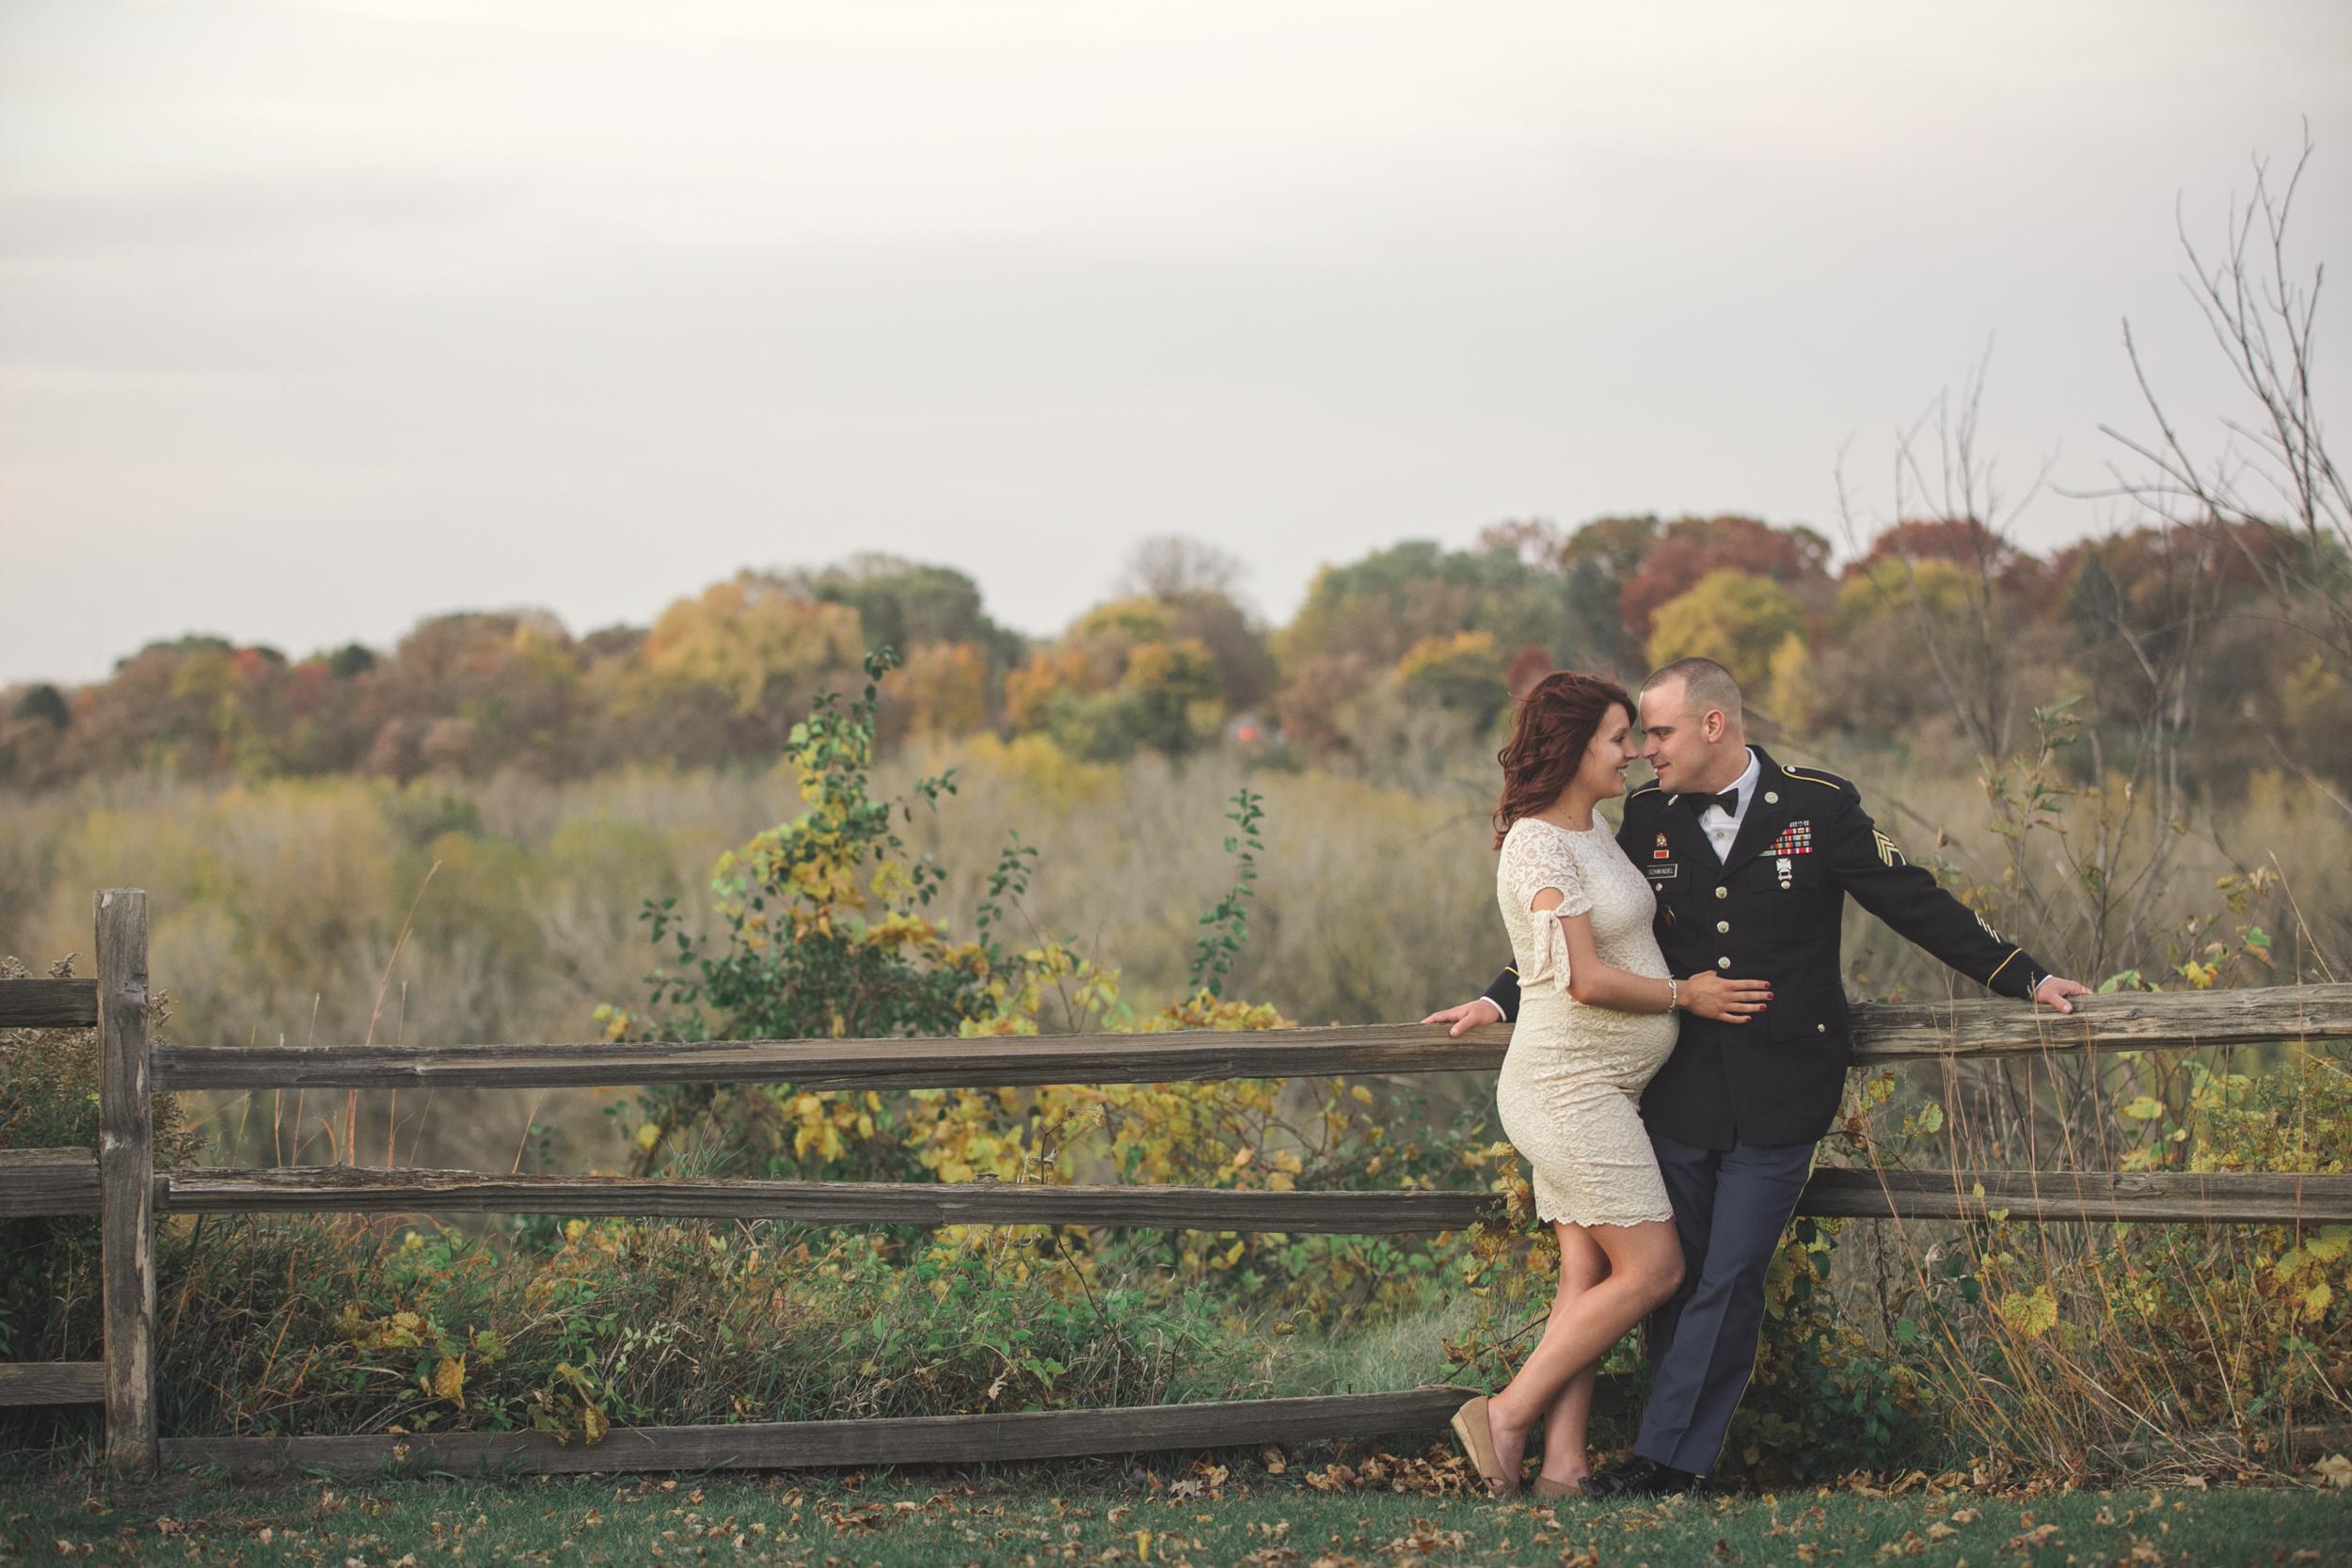 Fort Snelling Elopement St. Paul, MN, Fort Snelling Elopement, Military Elopement, Intimate Military Wedding, intimate elopement wedding-www.rachelsmak.com42.jpg